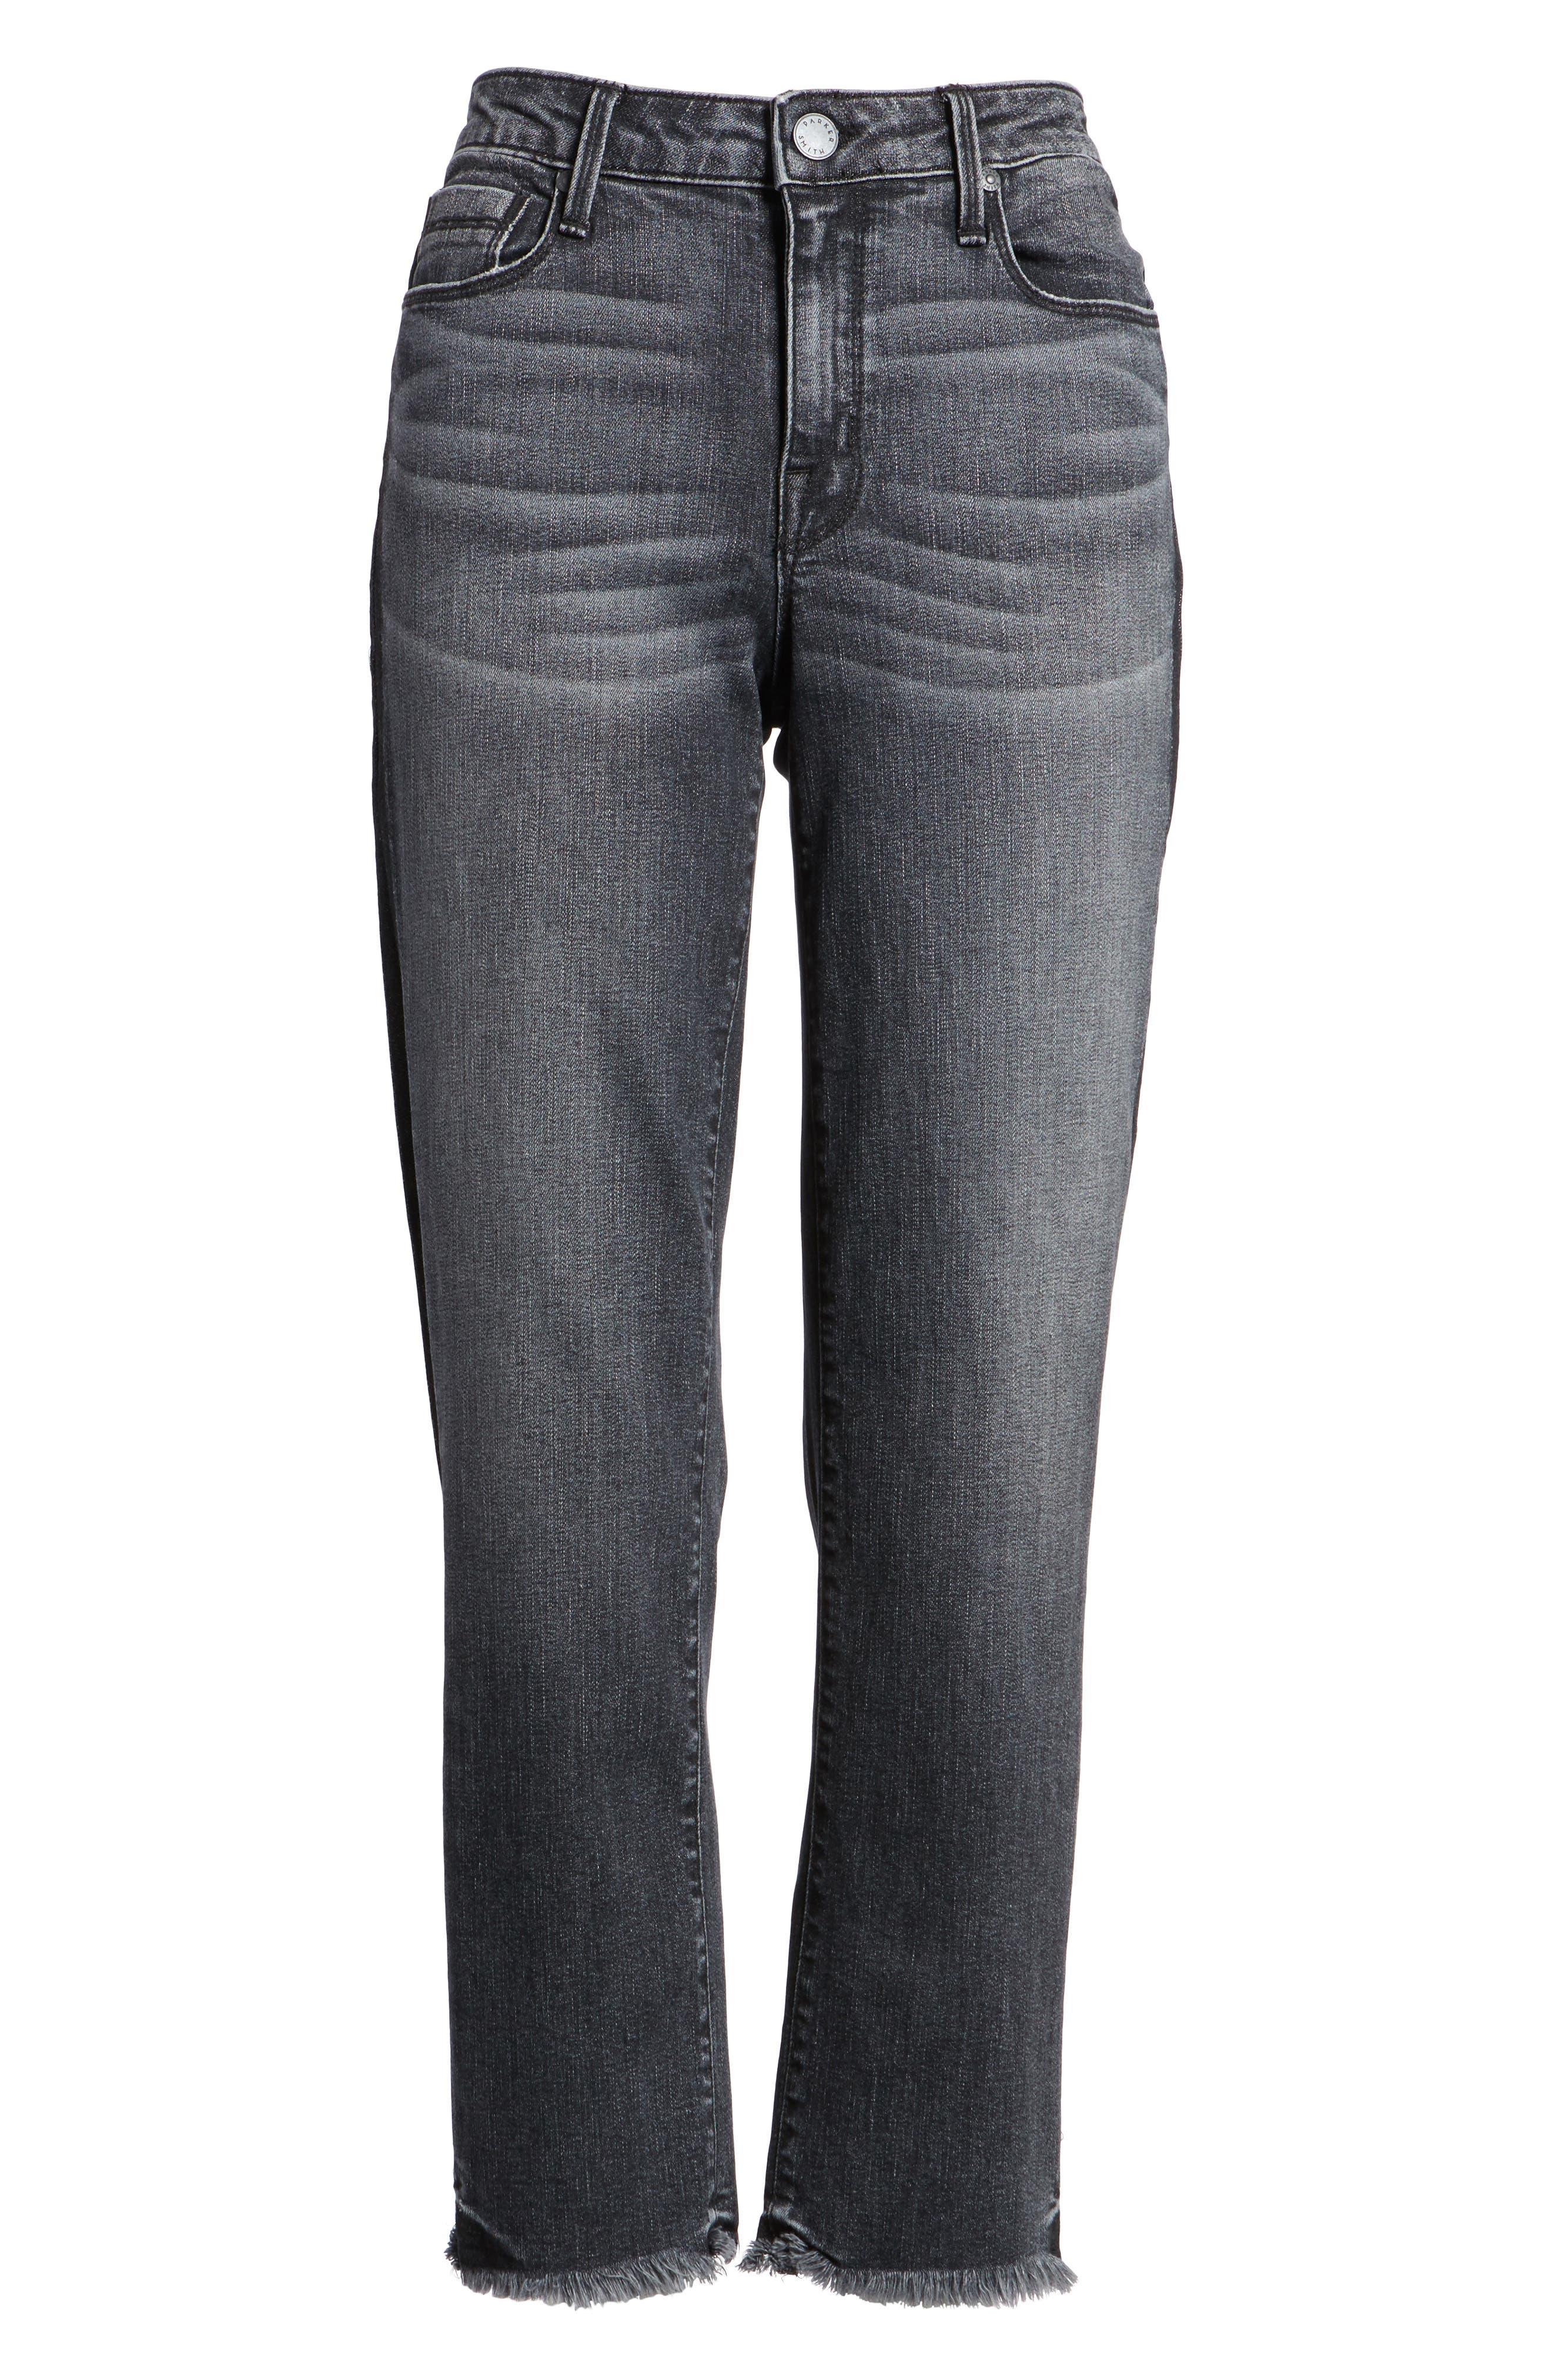 PARKER SMITH,                             Straight Leg Crop Jeans,                             Alternate thumbnail 6, color,                             010